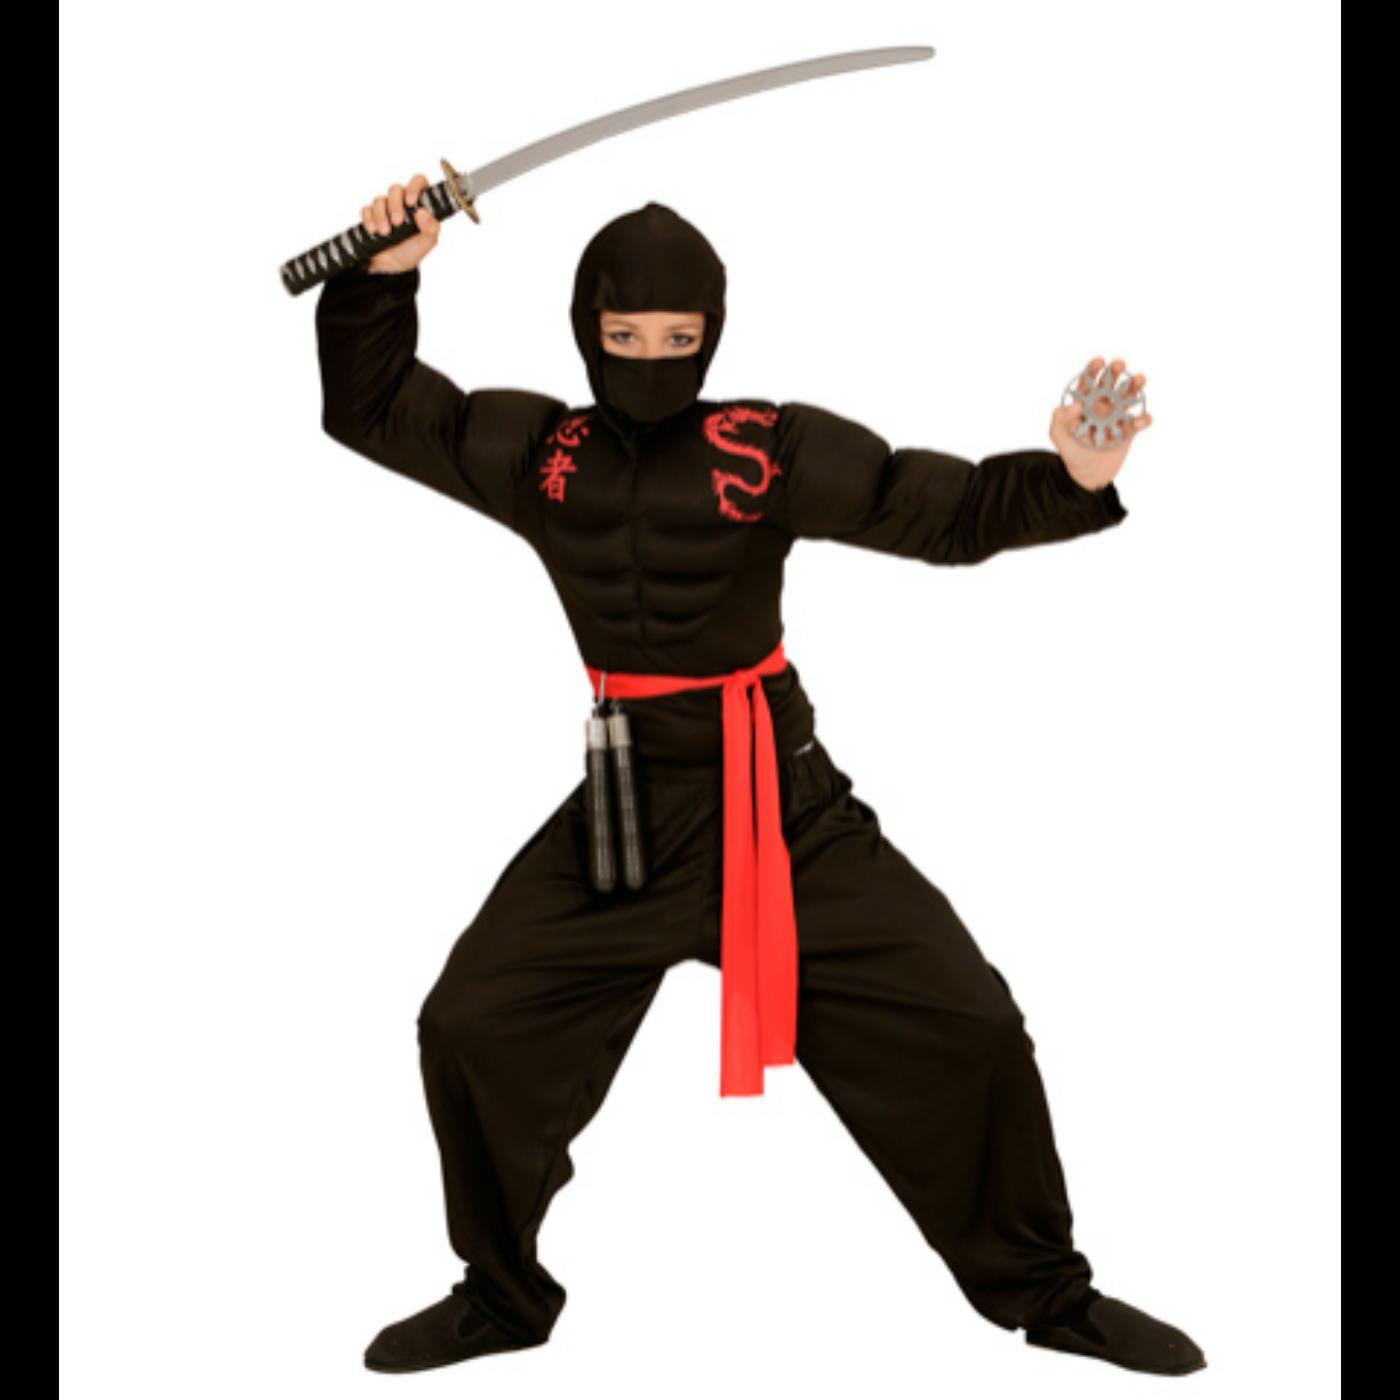 Szuper ninja jelmez 158-as